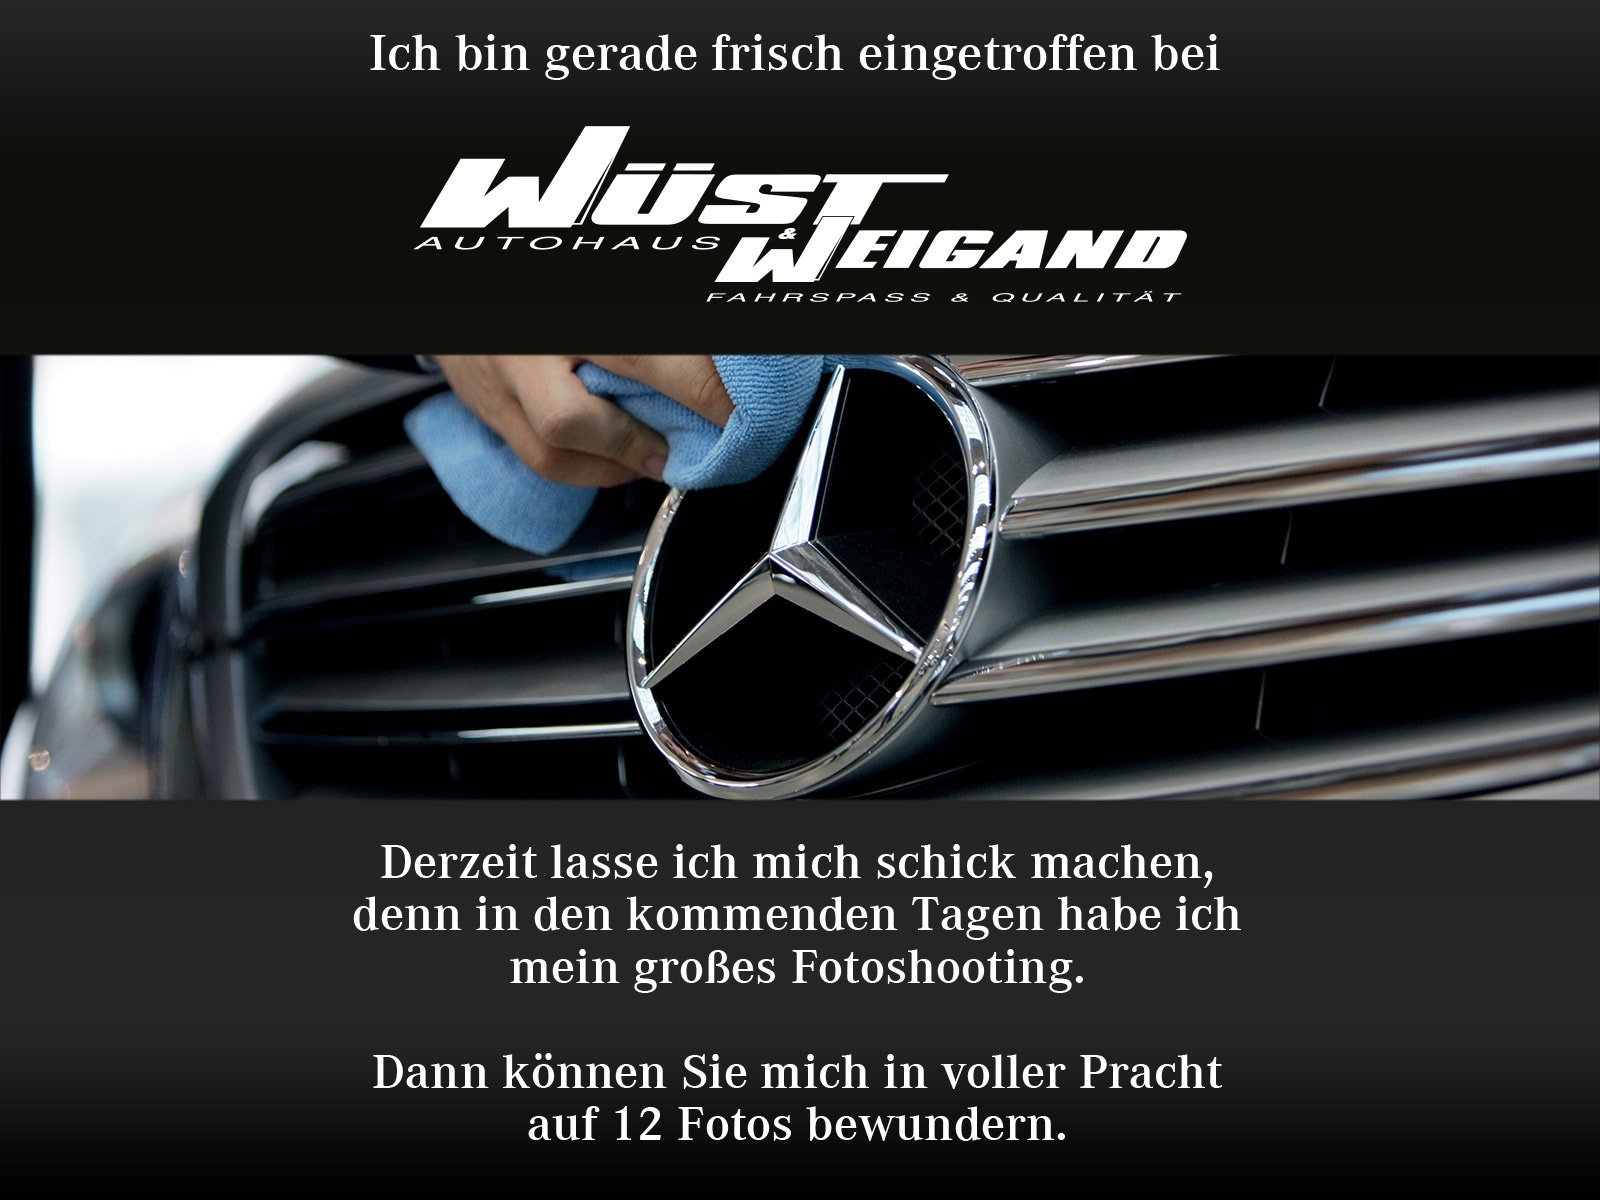 Mercedes-Benz CLS 350 d 4MATIC SB Comand+AHK+Distronic+Multib., Jahr 2016, Diesel